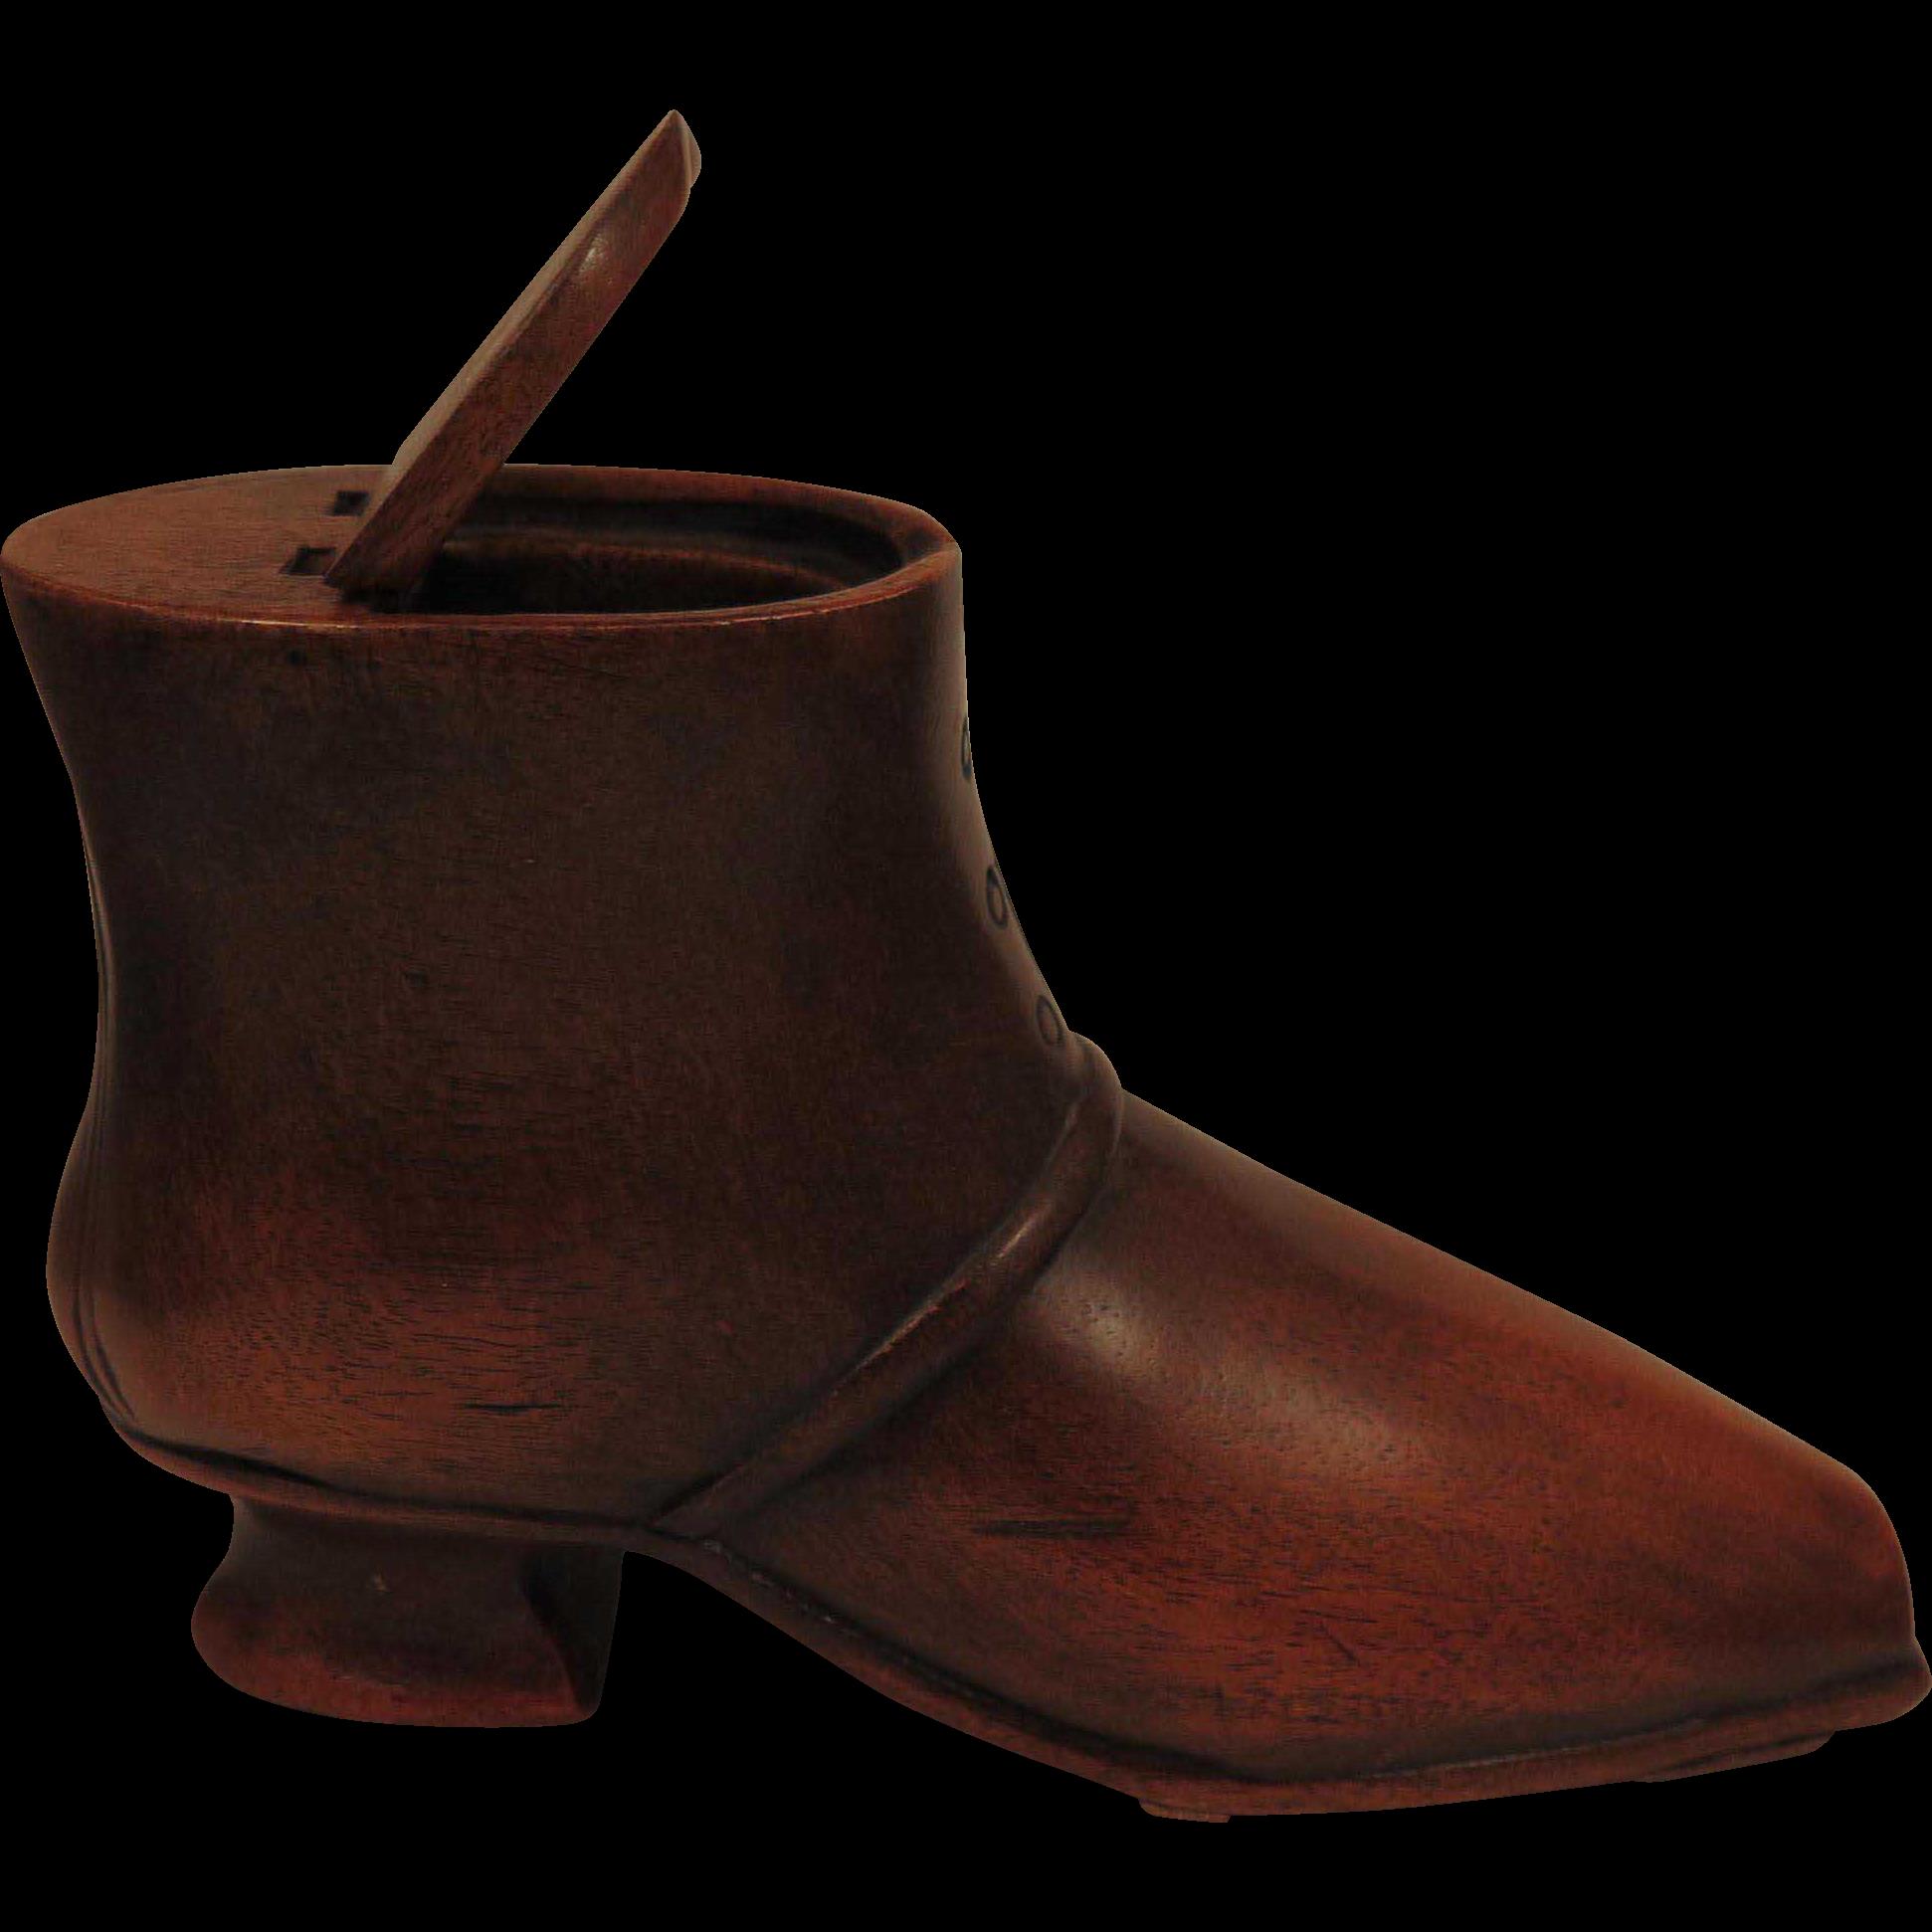 Antique Wood Shoe Snuff Box